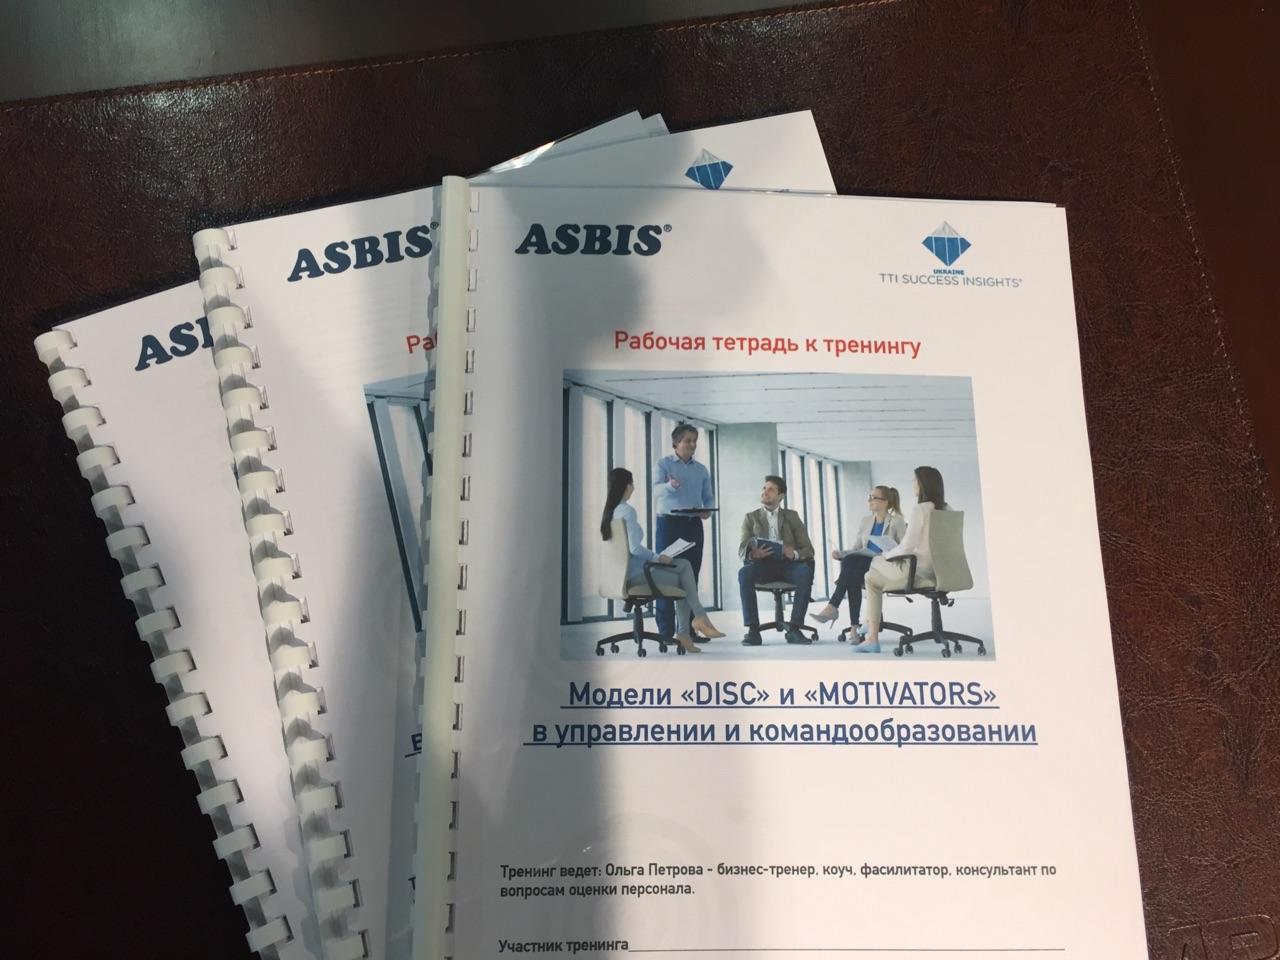 Фотоотчет с тренинга «АСБИС», Беларусь, Минск, 11-12.11.17